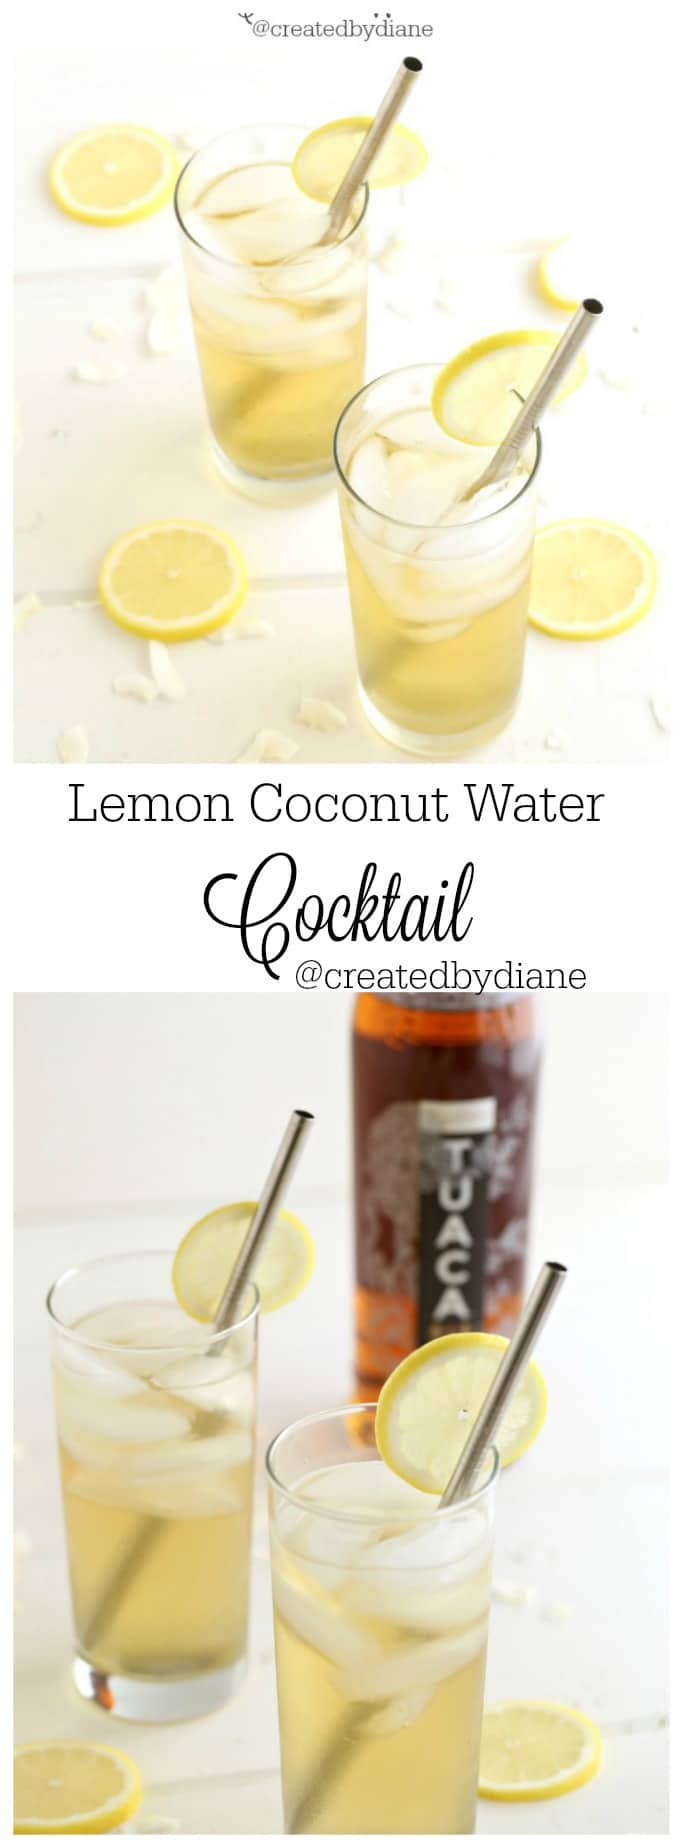 Lemon coconut Water cocktail @createdbydiane